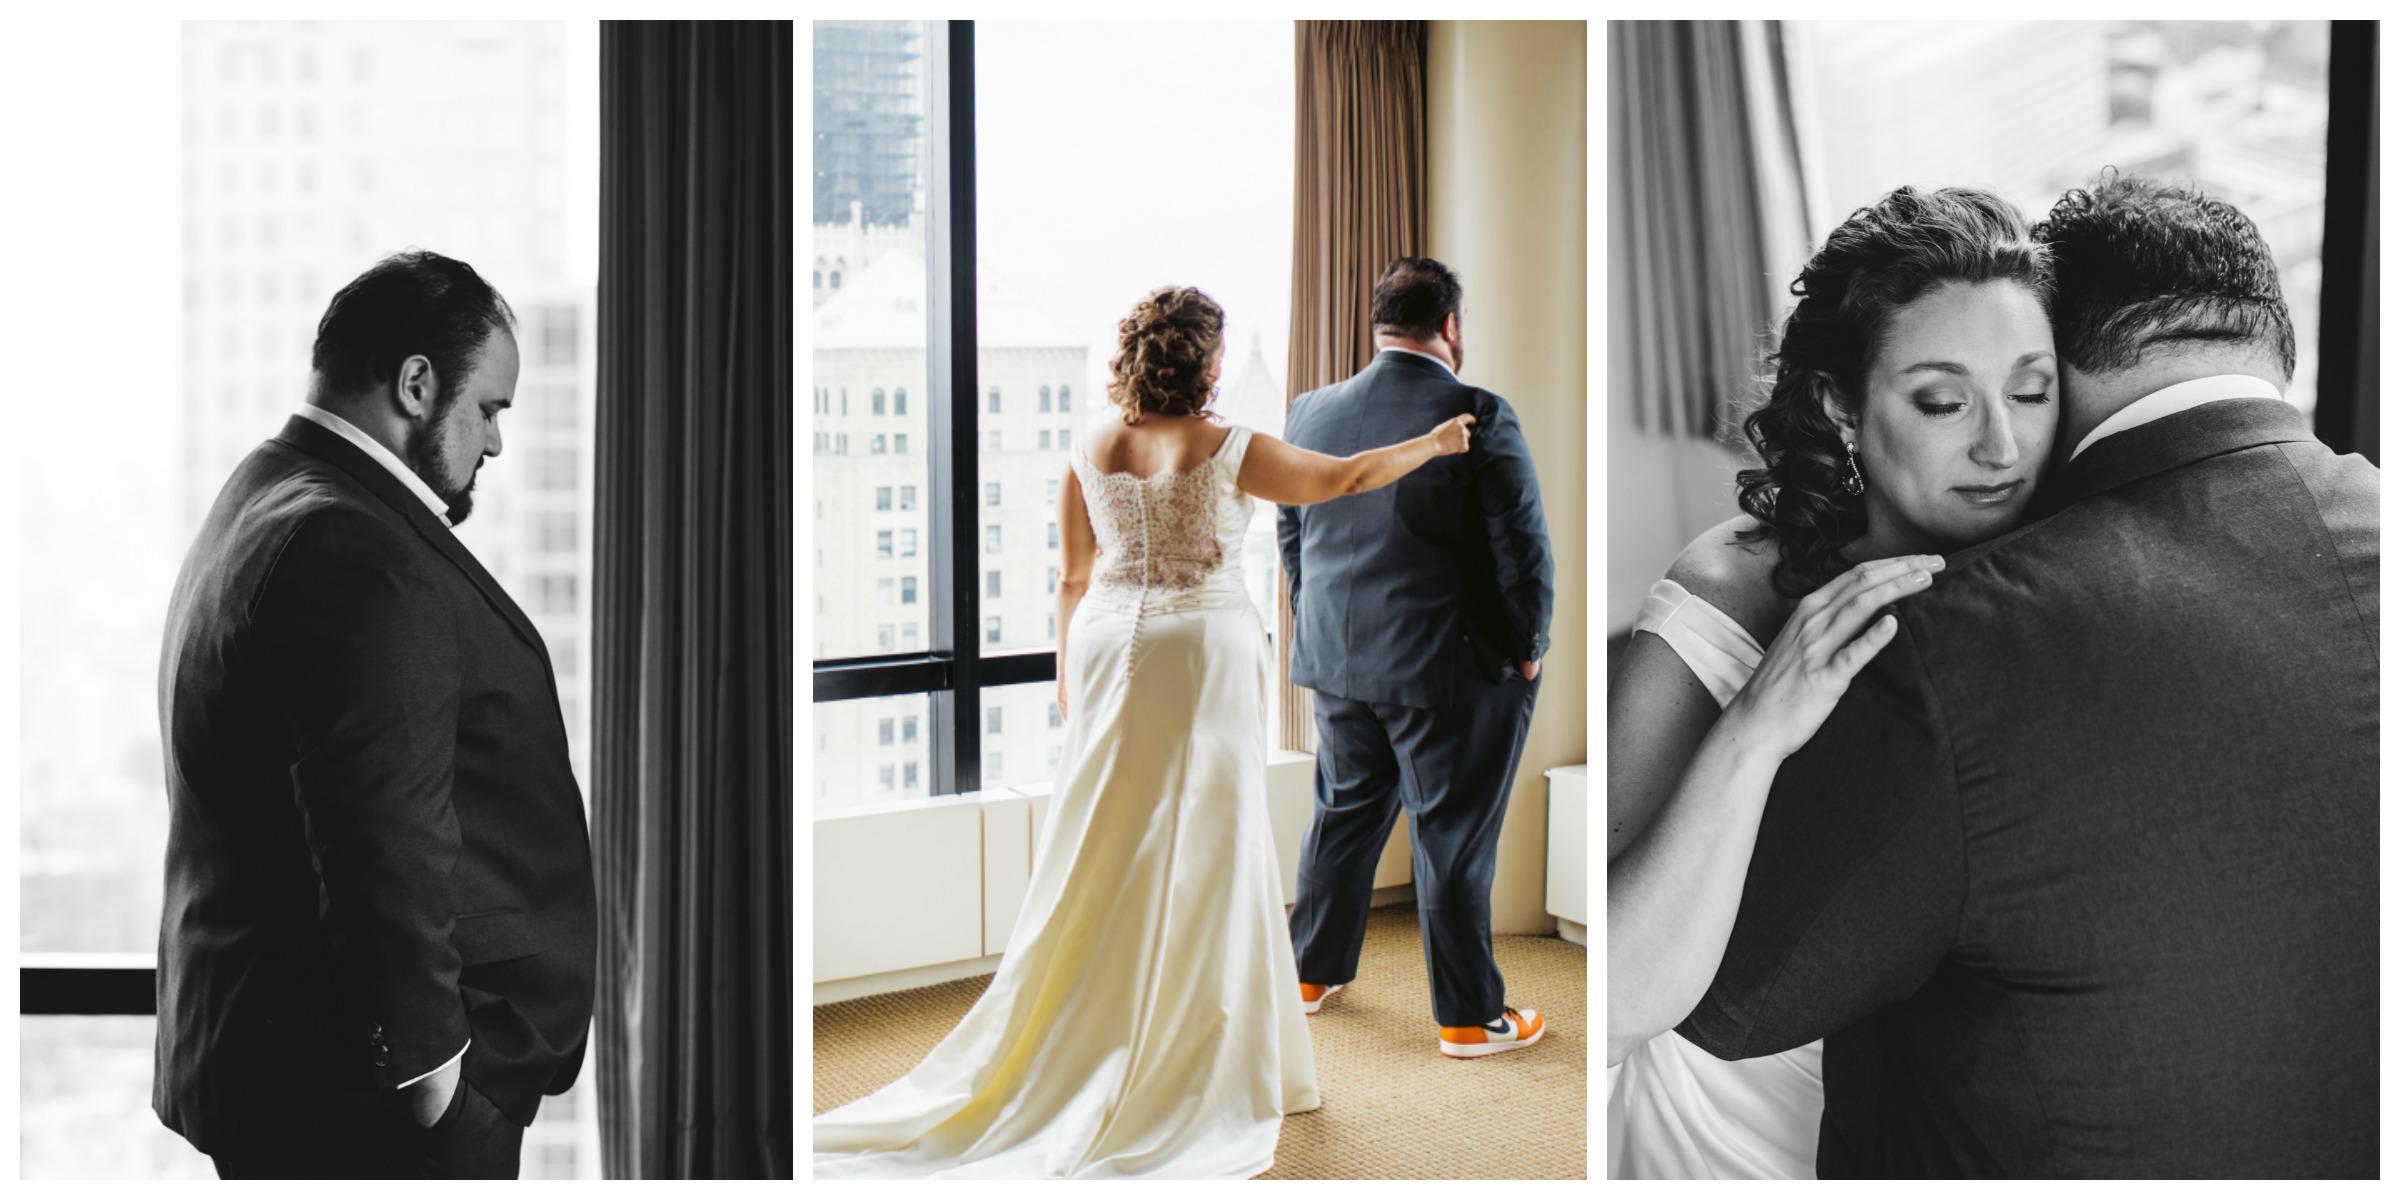 BATTERY PARK GARDENS WEDDING - NYC INTIMATE WEDDING PHOTOGRAPHER - CHI-CHI ARI 6.jpg